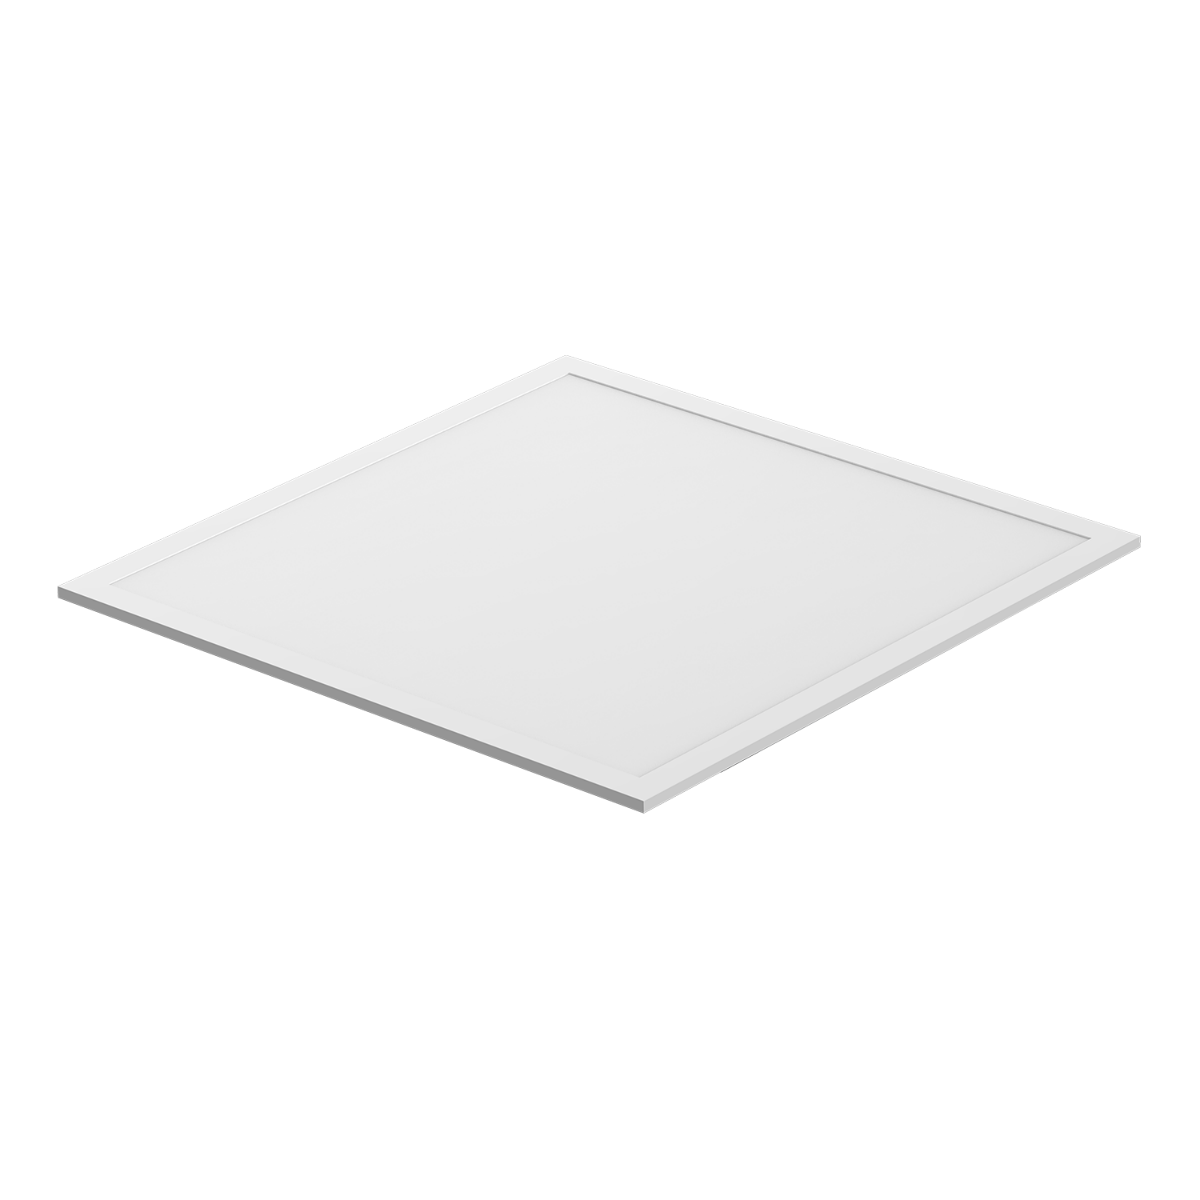 Noxion LED Panel Econox 32W 60x60cm 3000K 3900lm UGR <22 | Varm Vit - Ersättare 4x18W